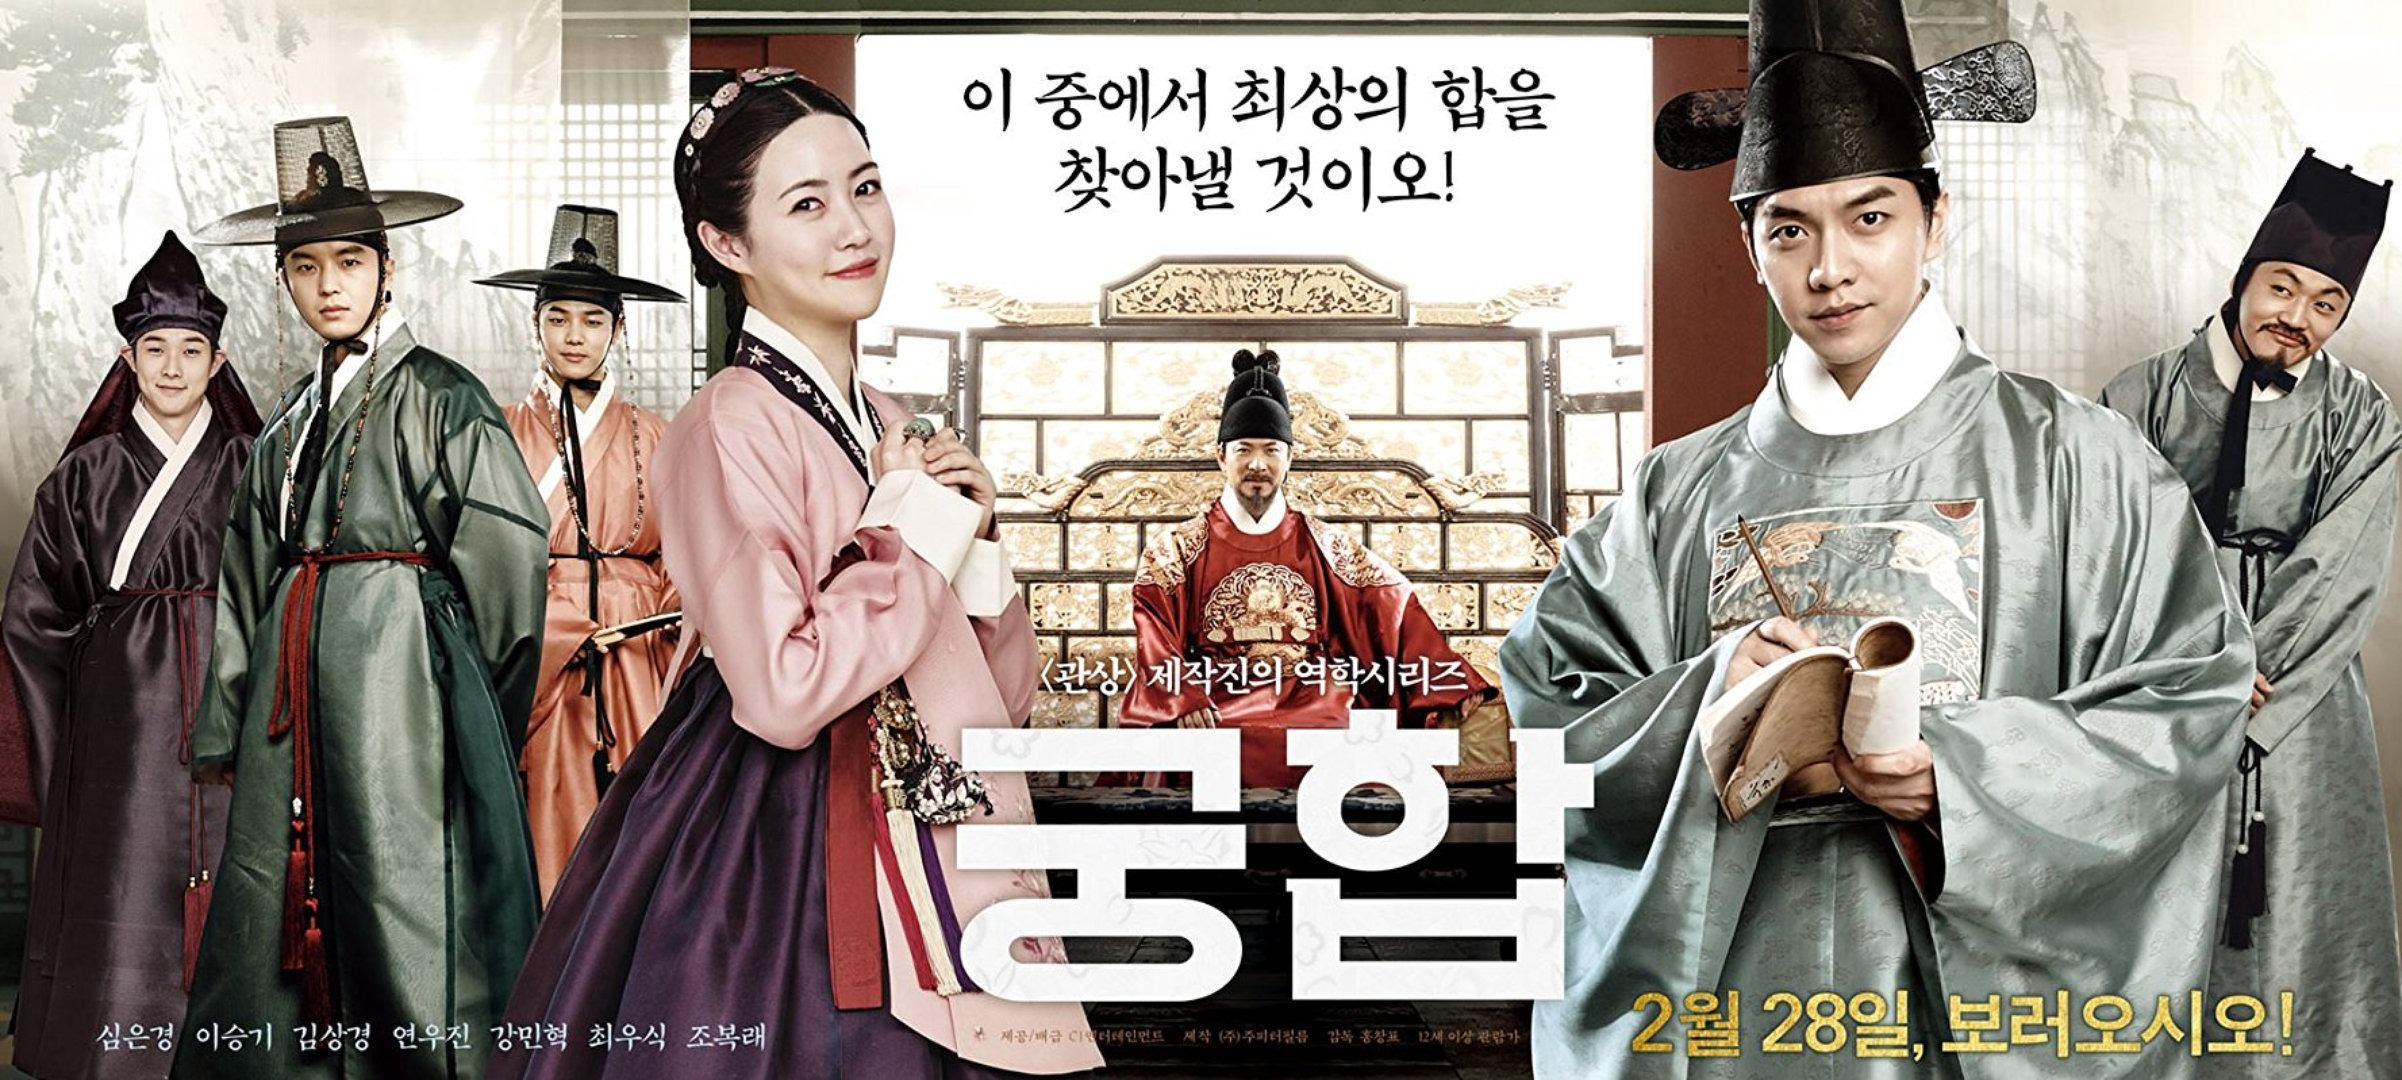 Movie, 궁합(韓國) / 野蠻公主玩婚記(台) / Marital Harmony(英文) / 宫合(網), 電影海報, 韓國, 橫版